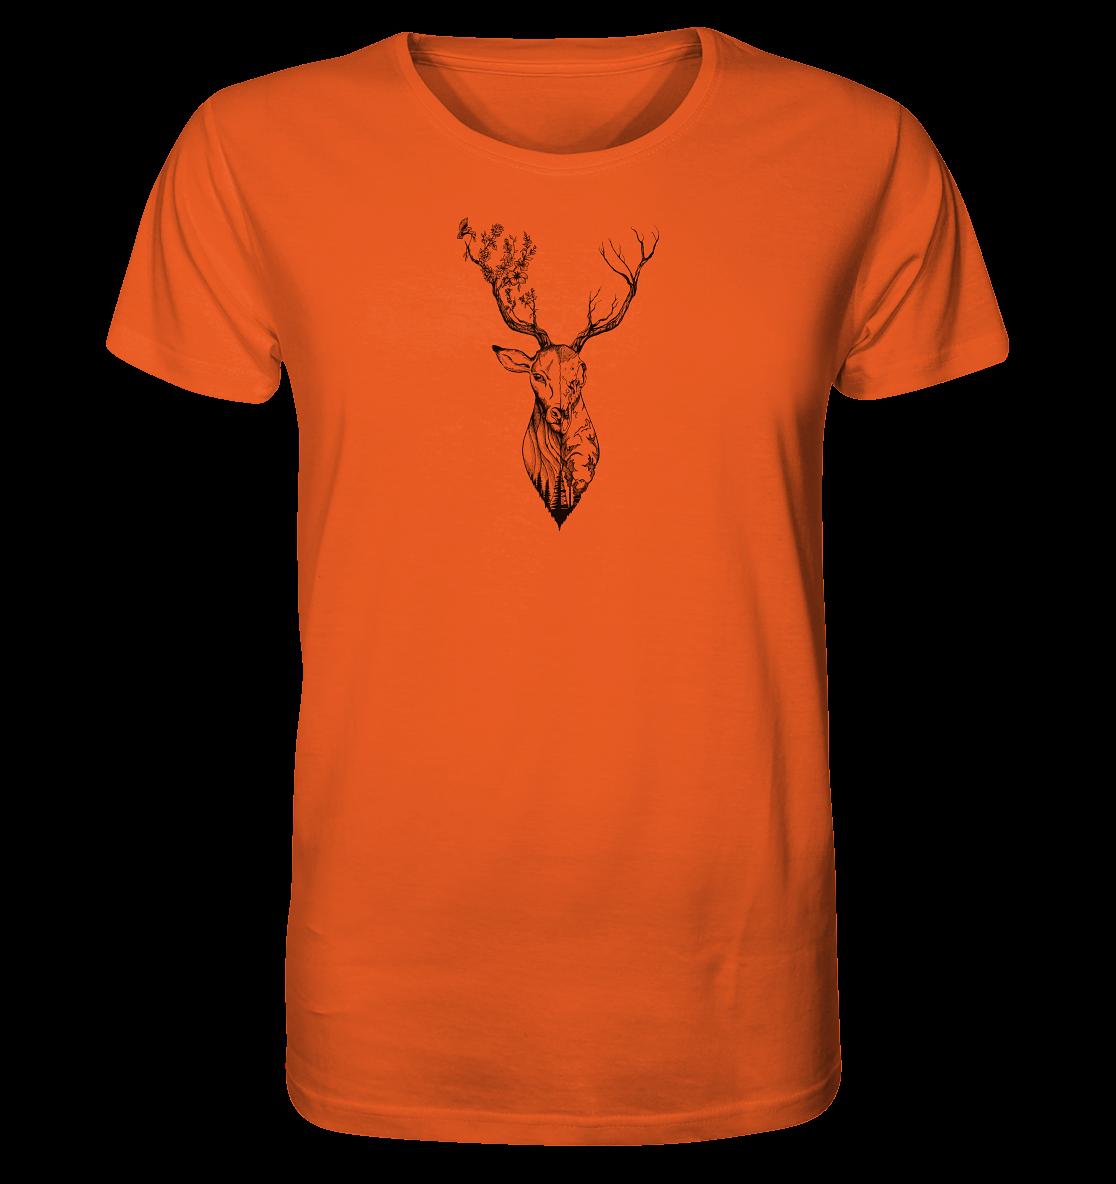 front-organic-shirt-ea5b23-1116x-14.png